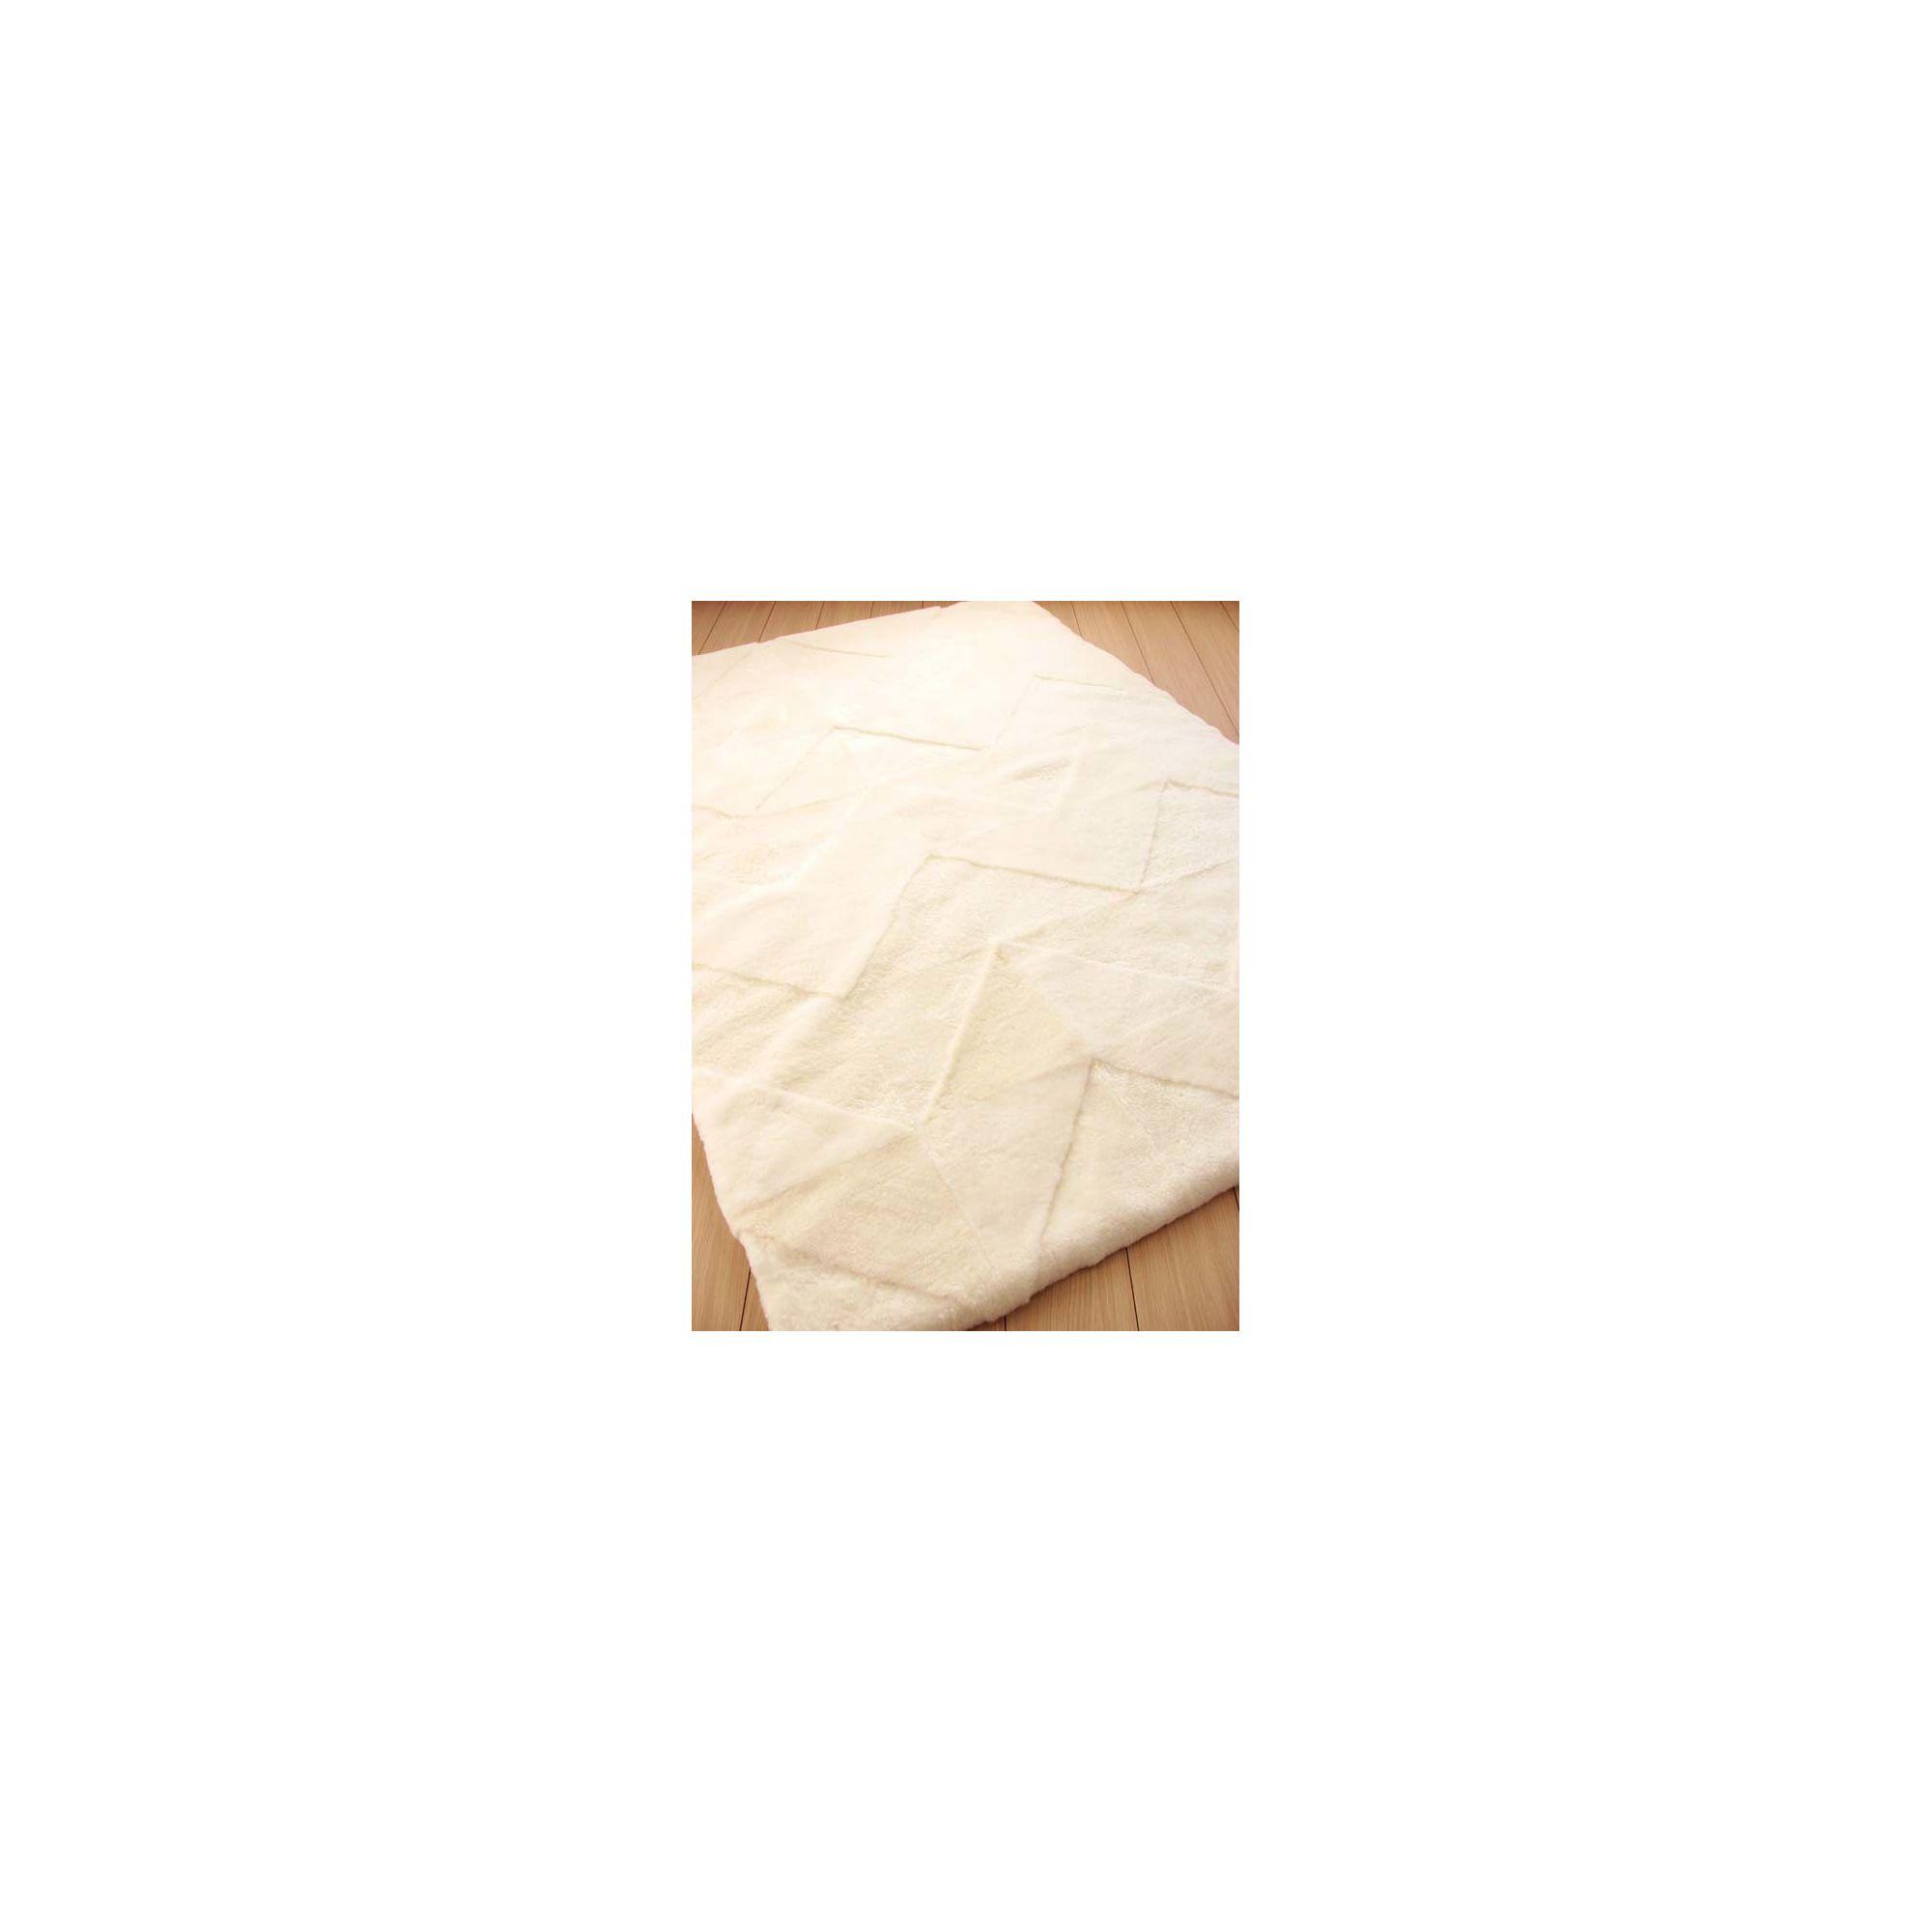 Bowron Sheepskin Shortwool Design Vintage 42 White Rug - 350cm H x 250cm W x 1cm D